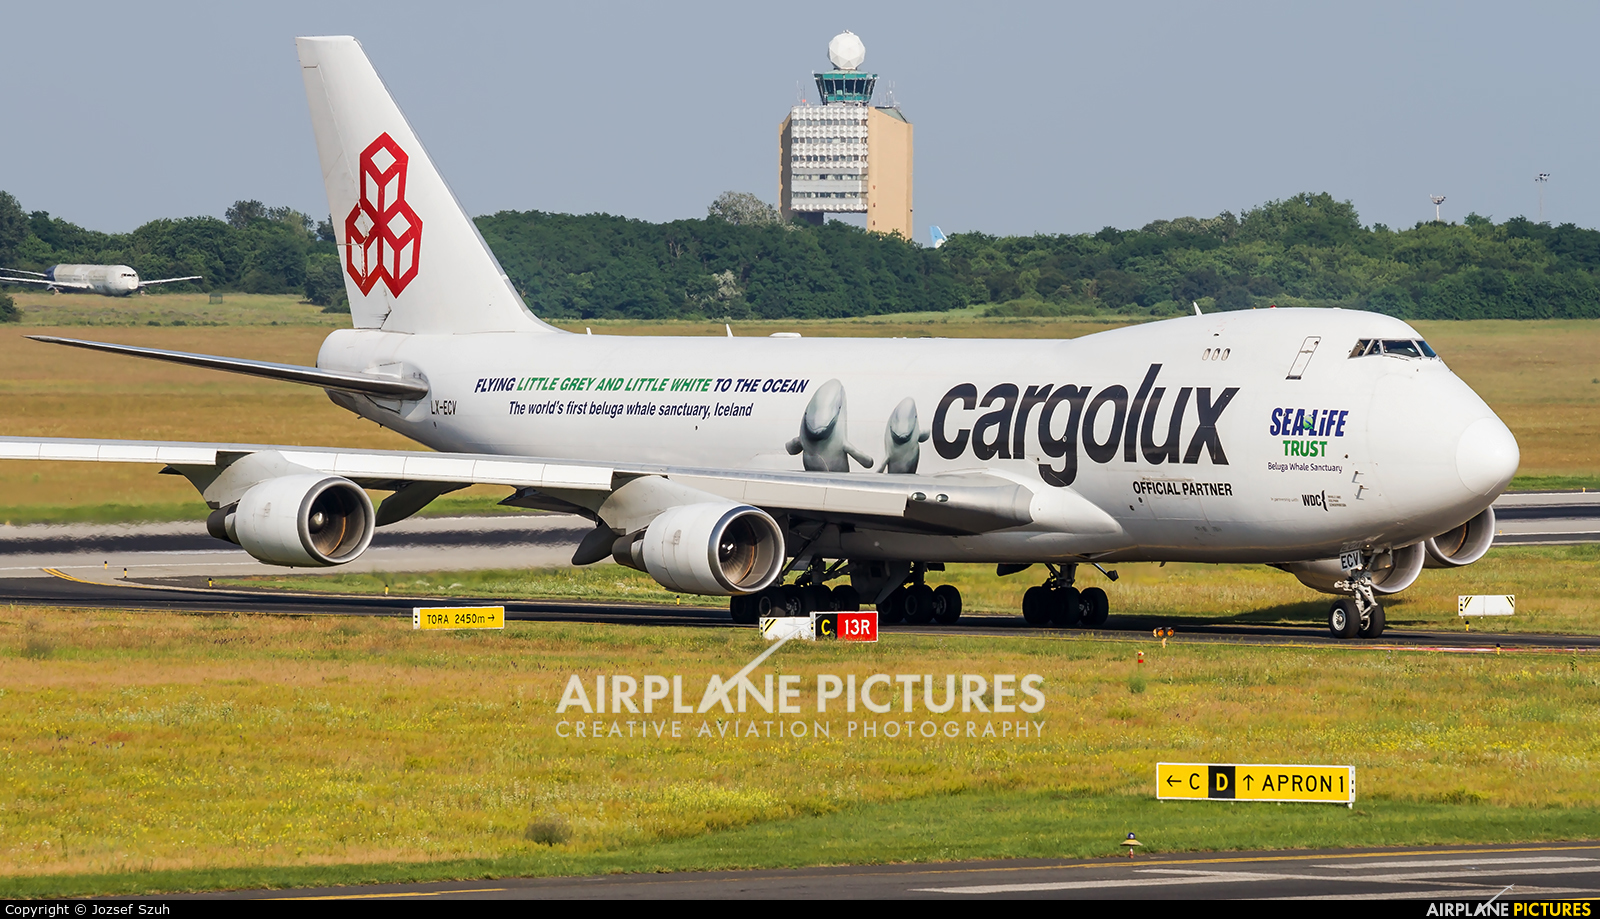 Cargolux LX-ECV aircraft at Budapest Ferenc Liszt International Airport